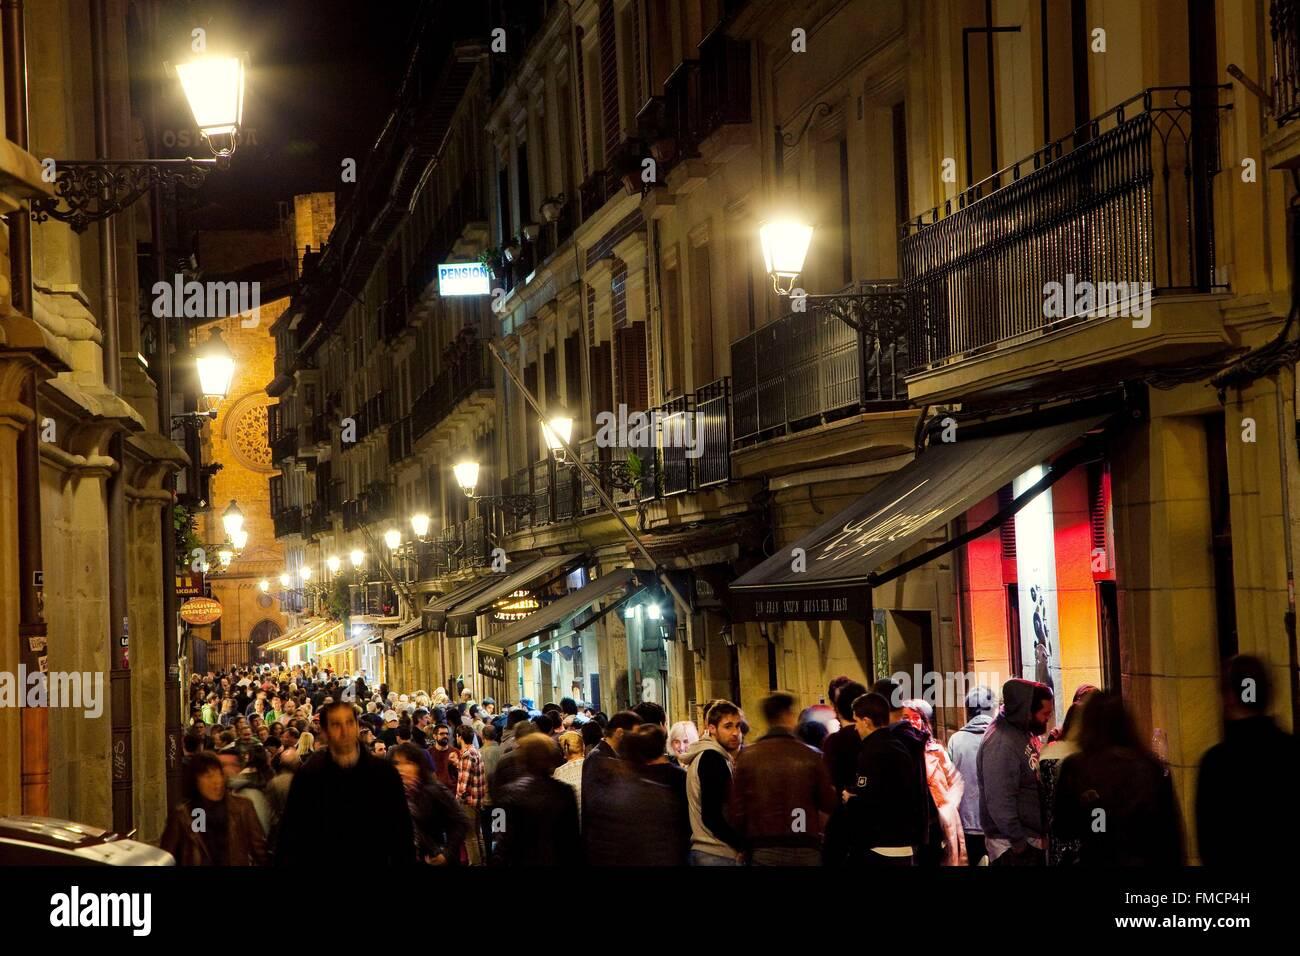 Spain, Basque Country, Guipuzcoa province (Guipuzkoa), San Sebastian (Donostia), European capital of culture 2016 - Stock Image